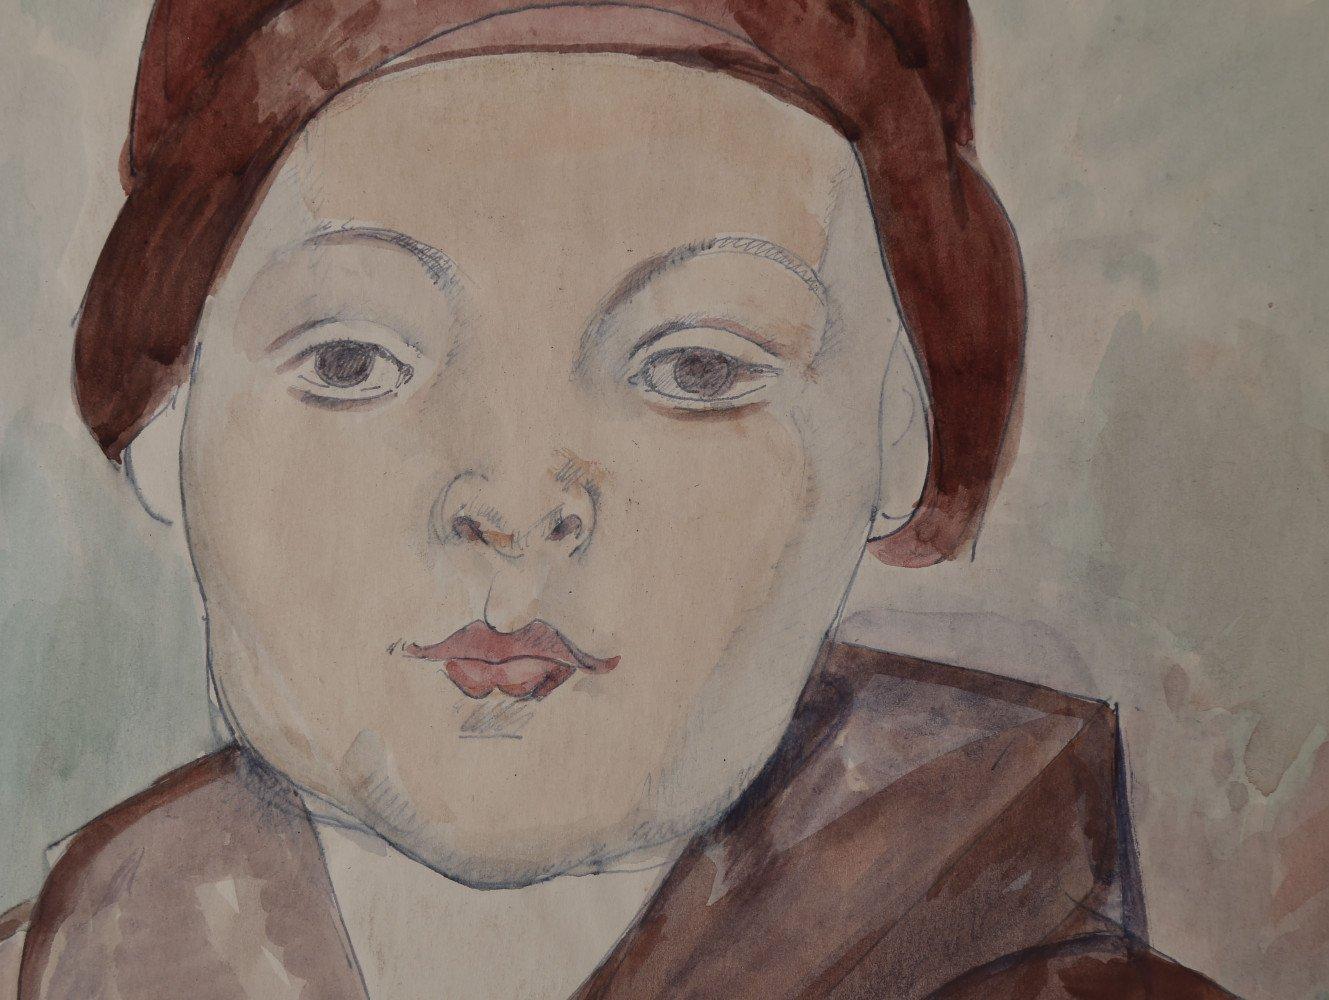 It's Me (Portrait of Robert Kulesa) by William Sommer